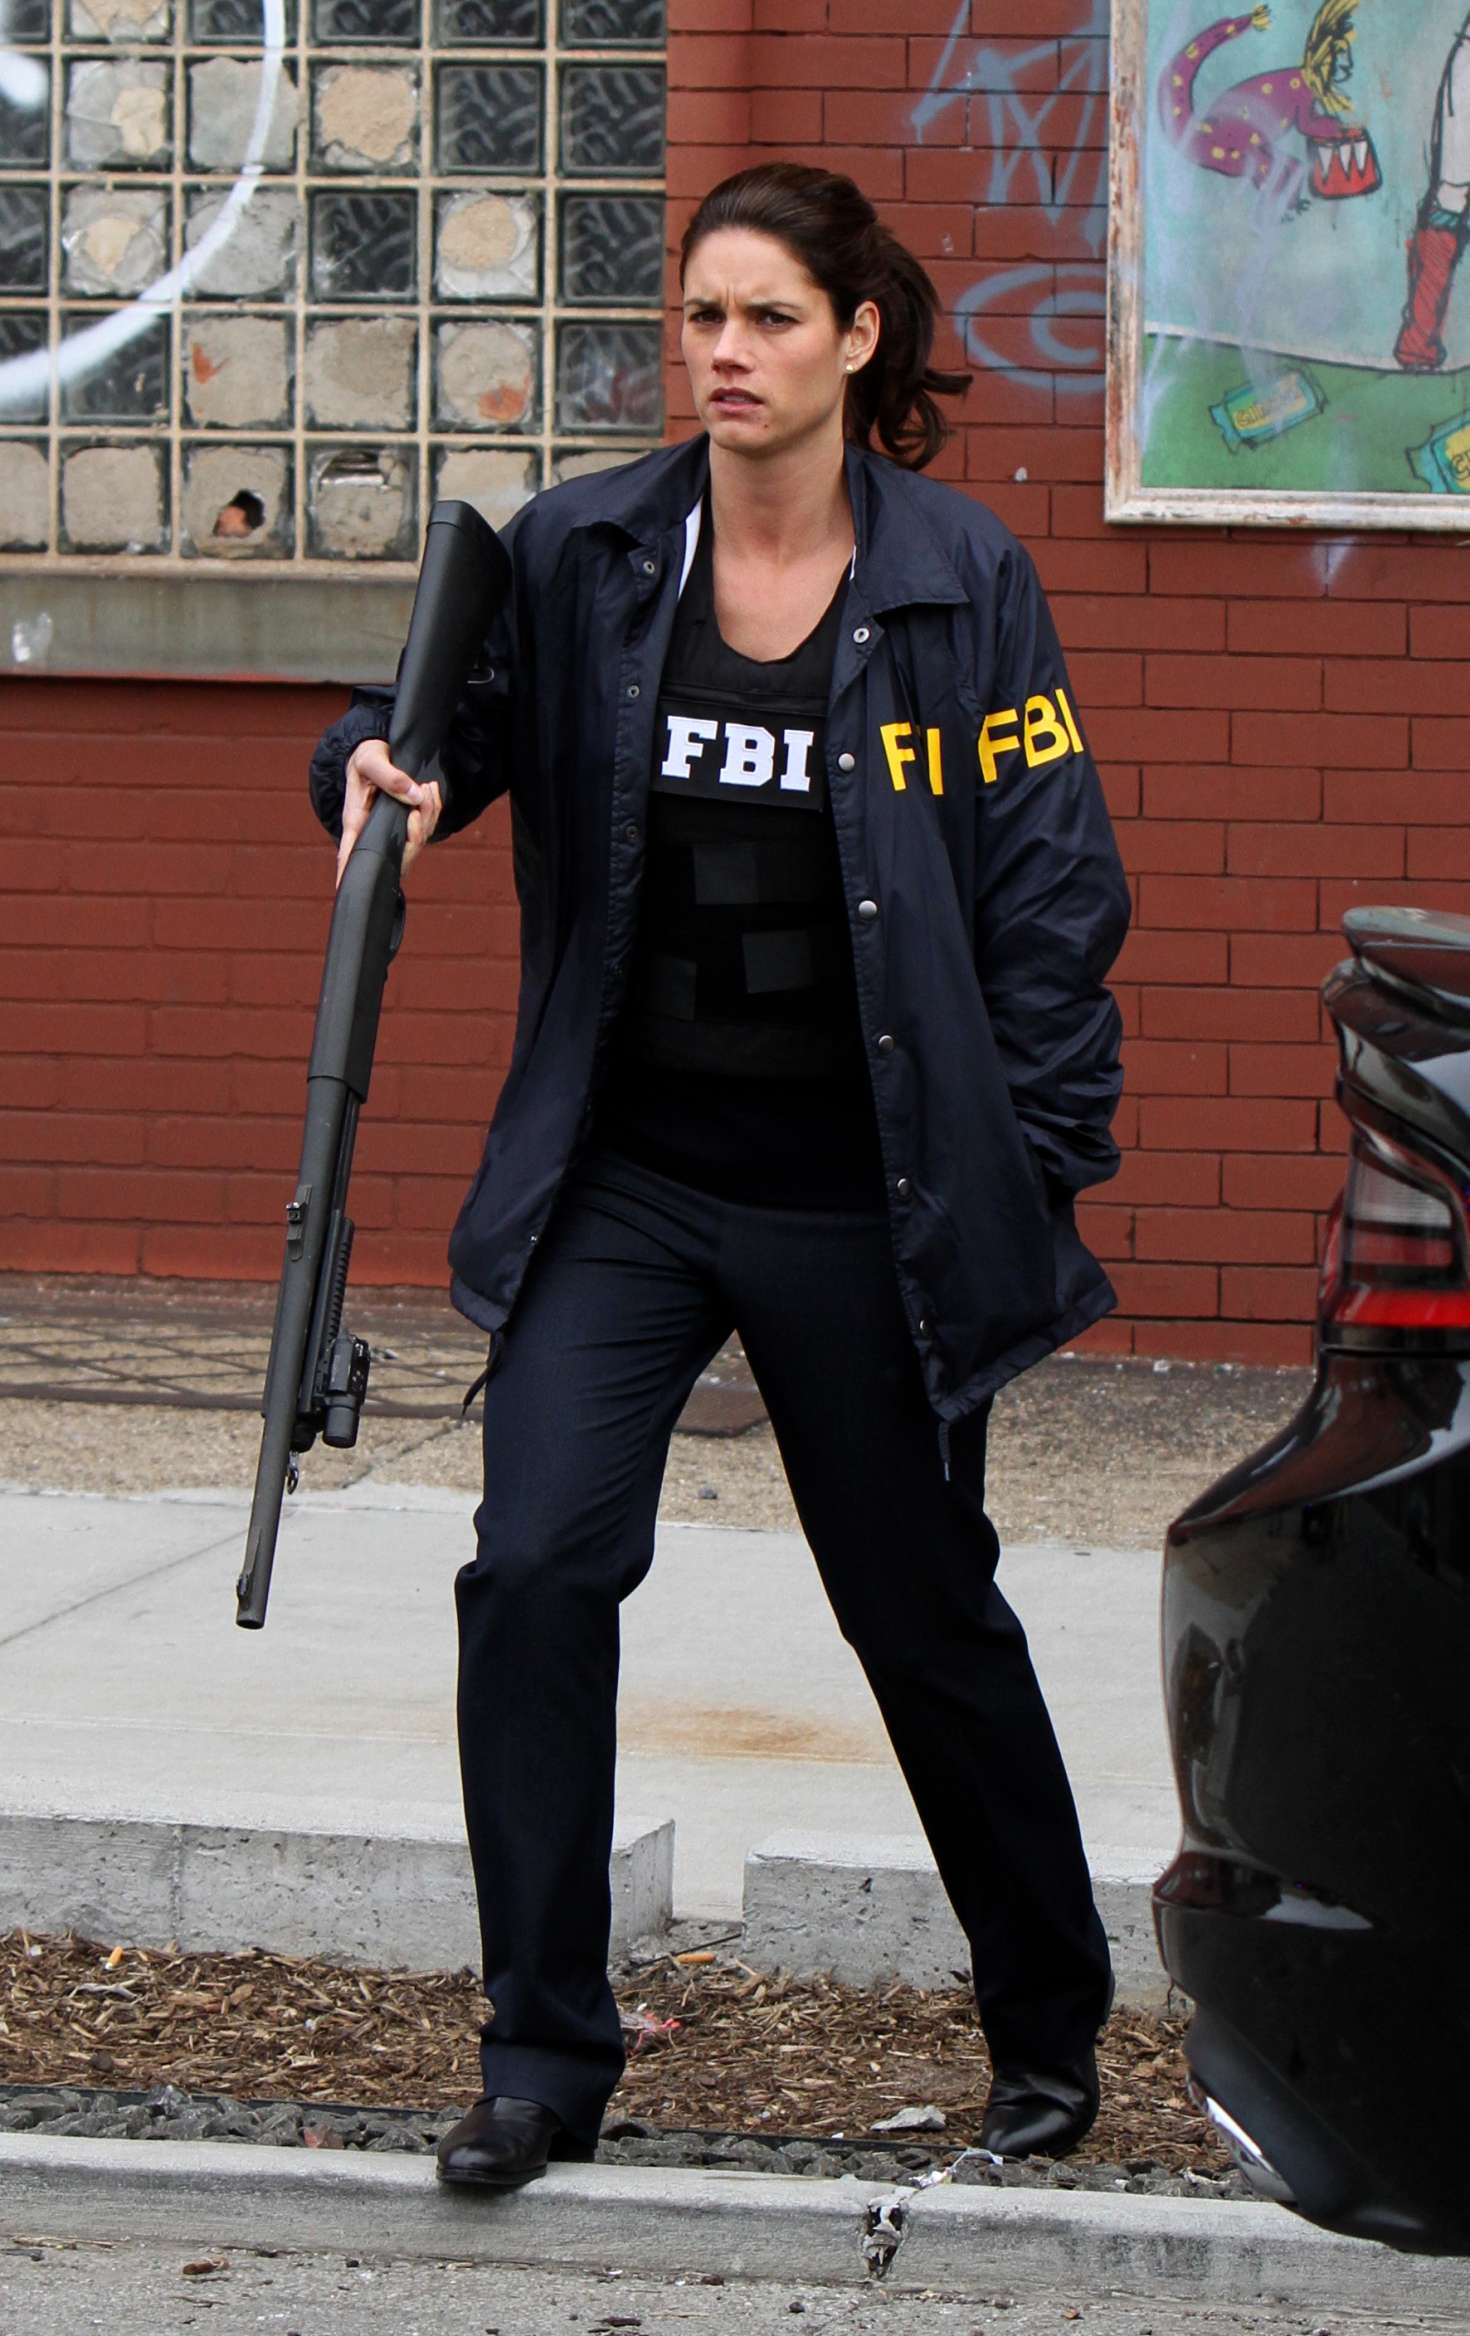 Missy Peregrym on the set of TV series FBI in Brooklyn